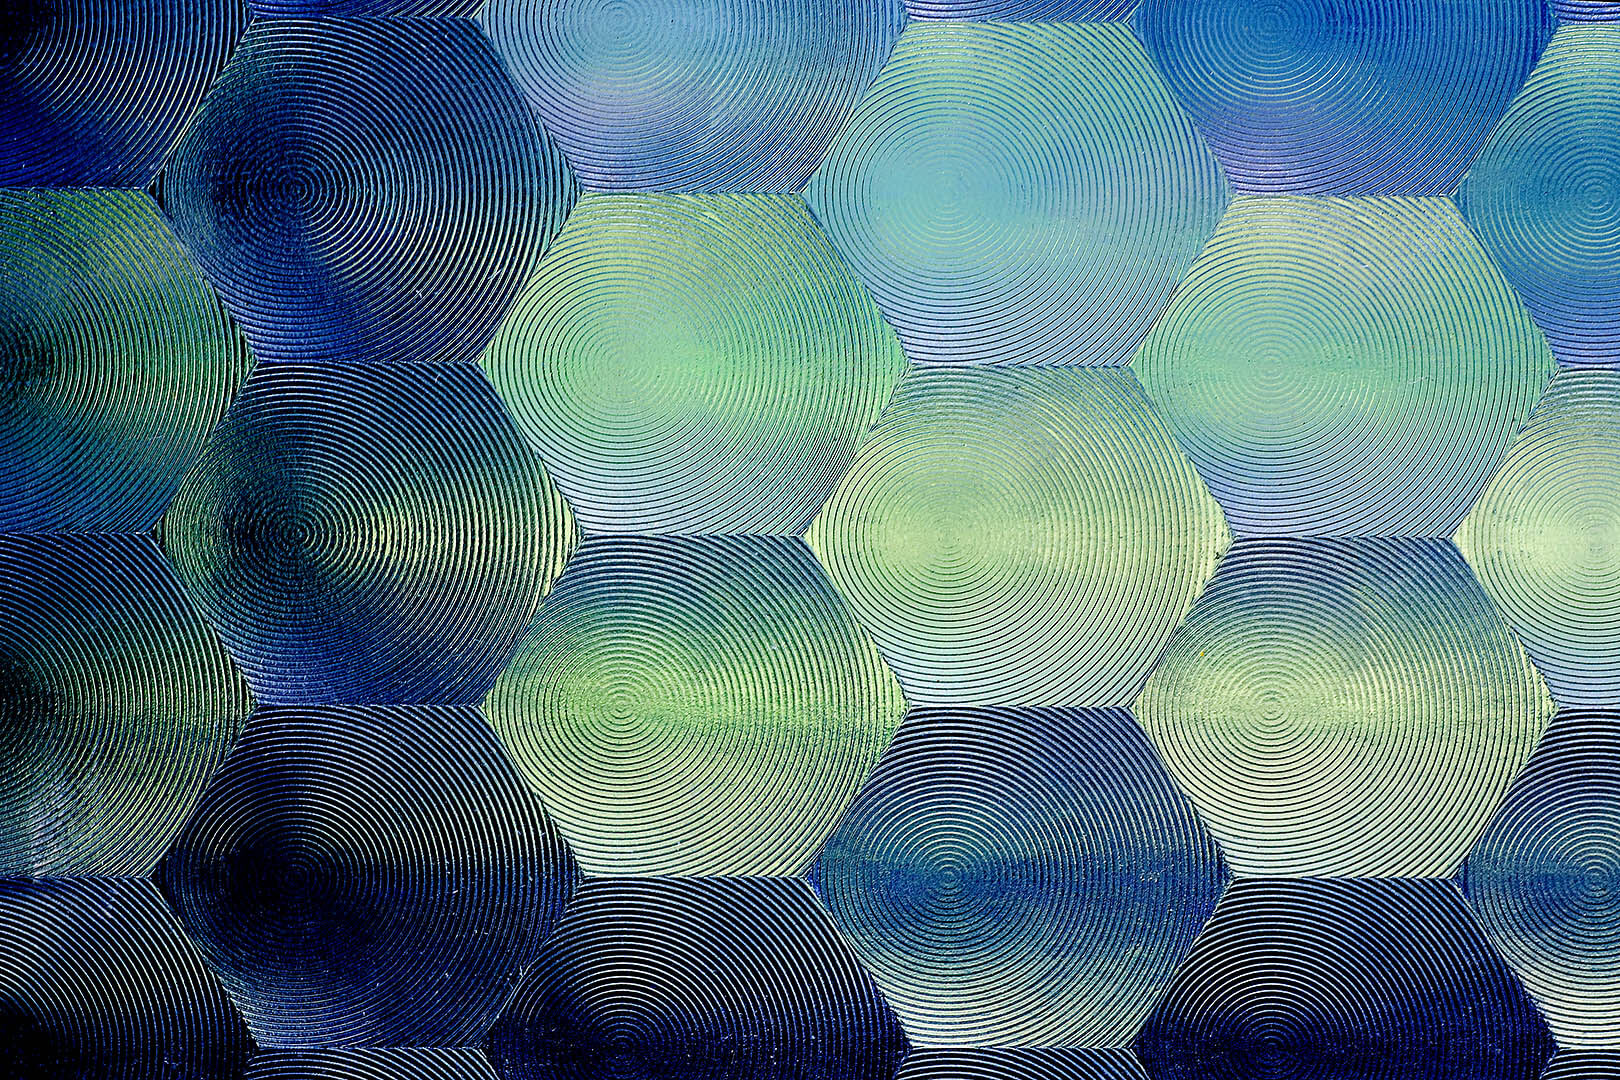 Hexagon Tiling